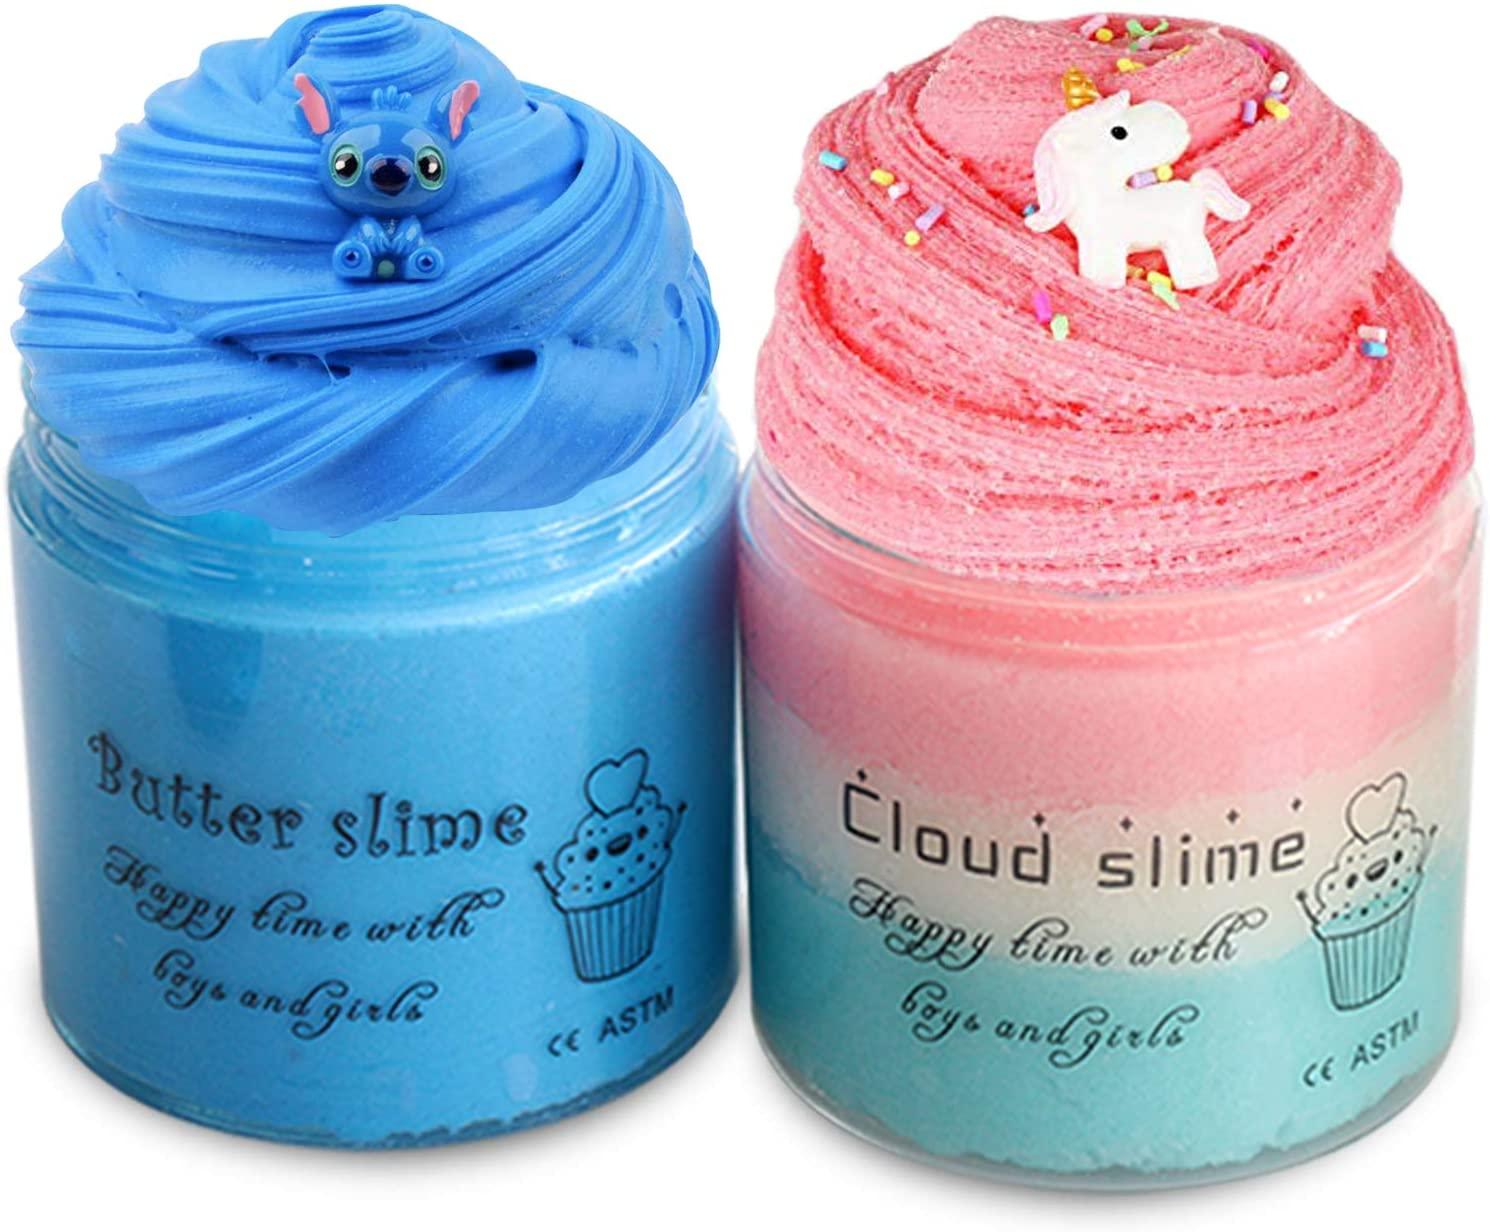 2 Pack Fluffy Butter Slime Kits Blue Cloud Slime Soft Stretchy Non Sticky DIY Scented Sludge Novelty Toys Slime Games for Kids(8 oz 200ML)